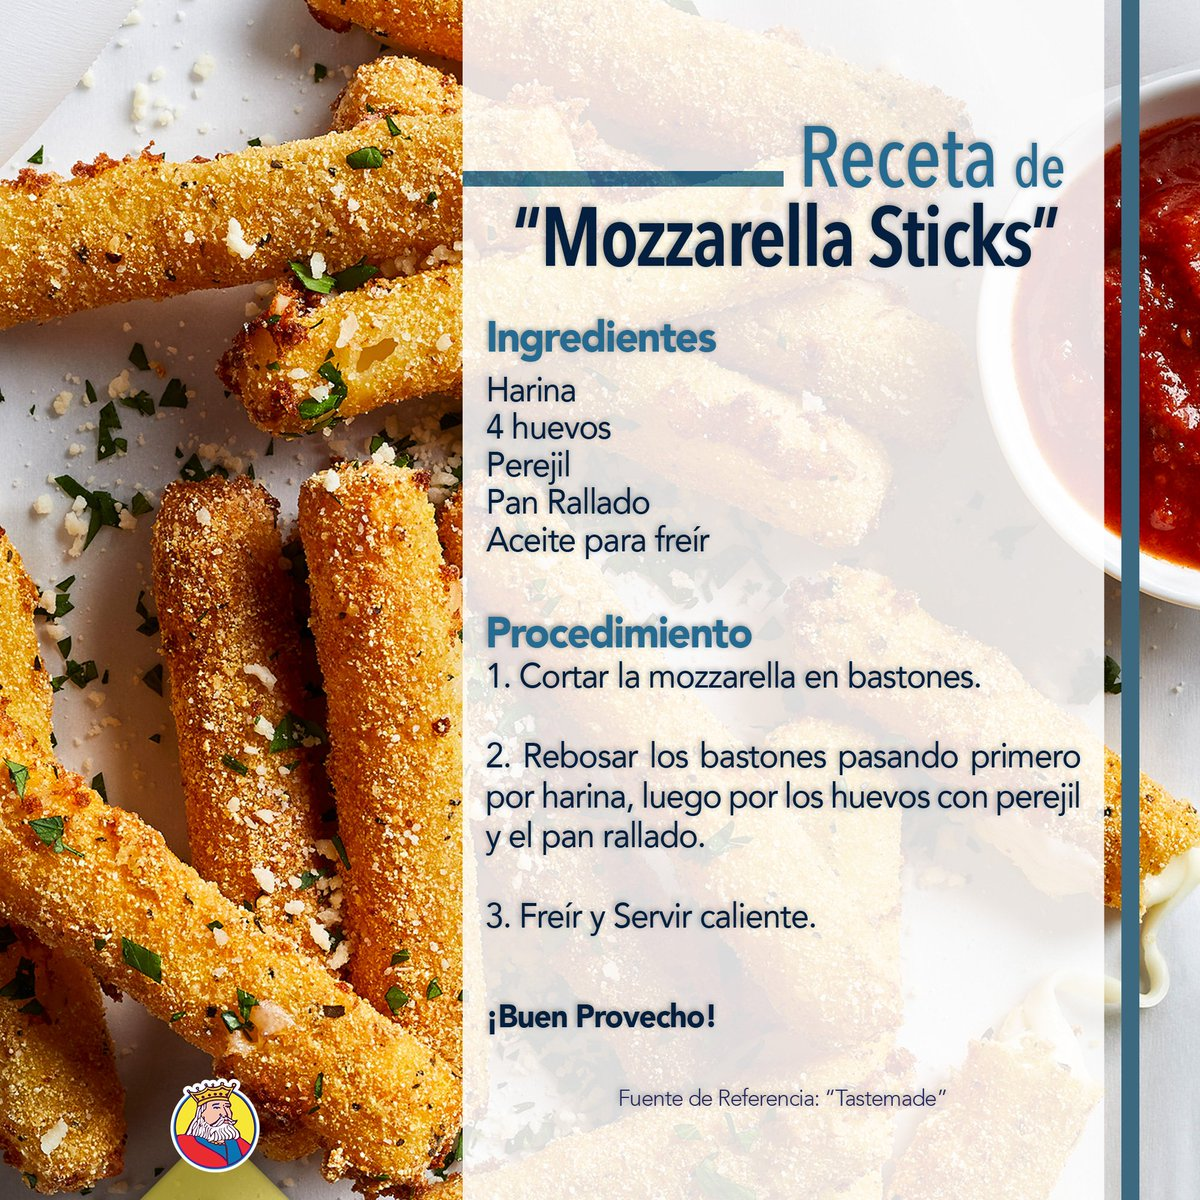 Receta De Mozzarella Sticks